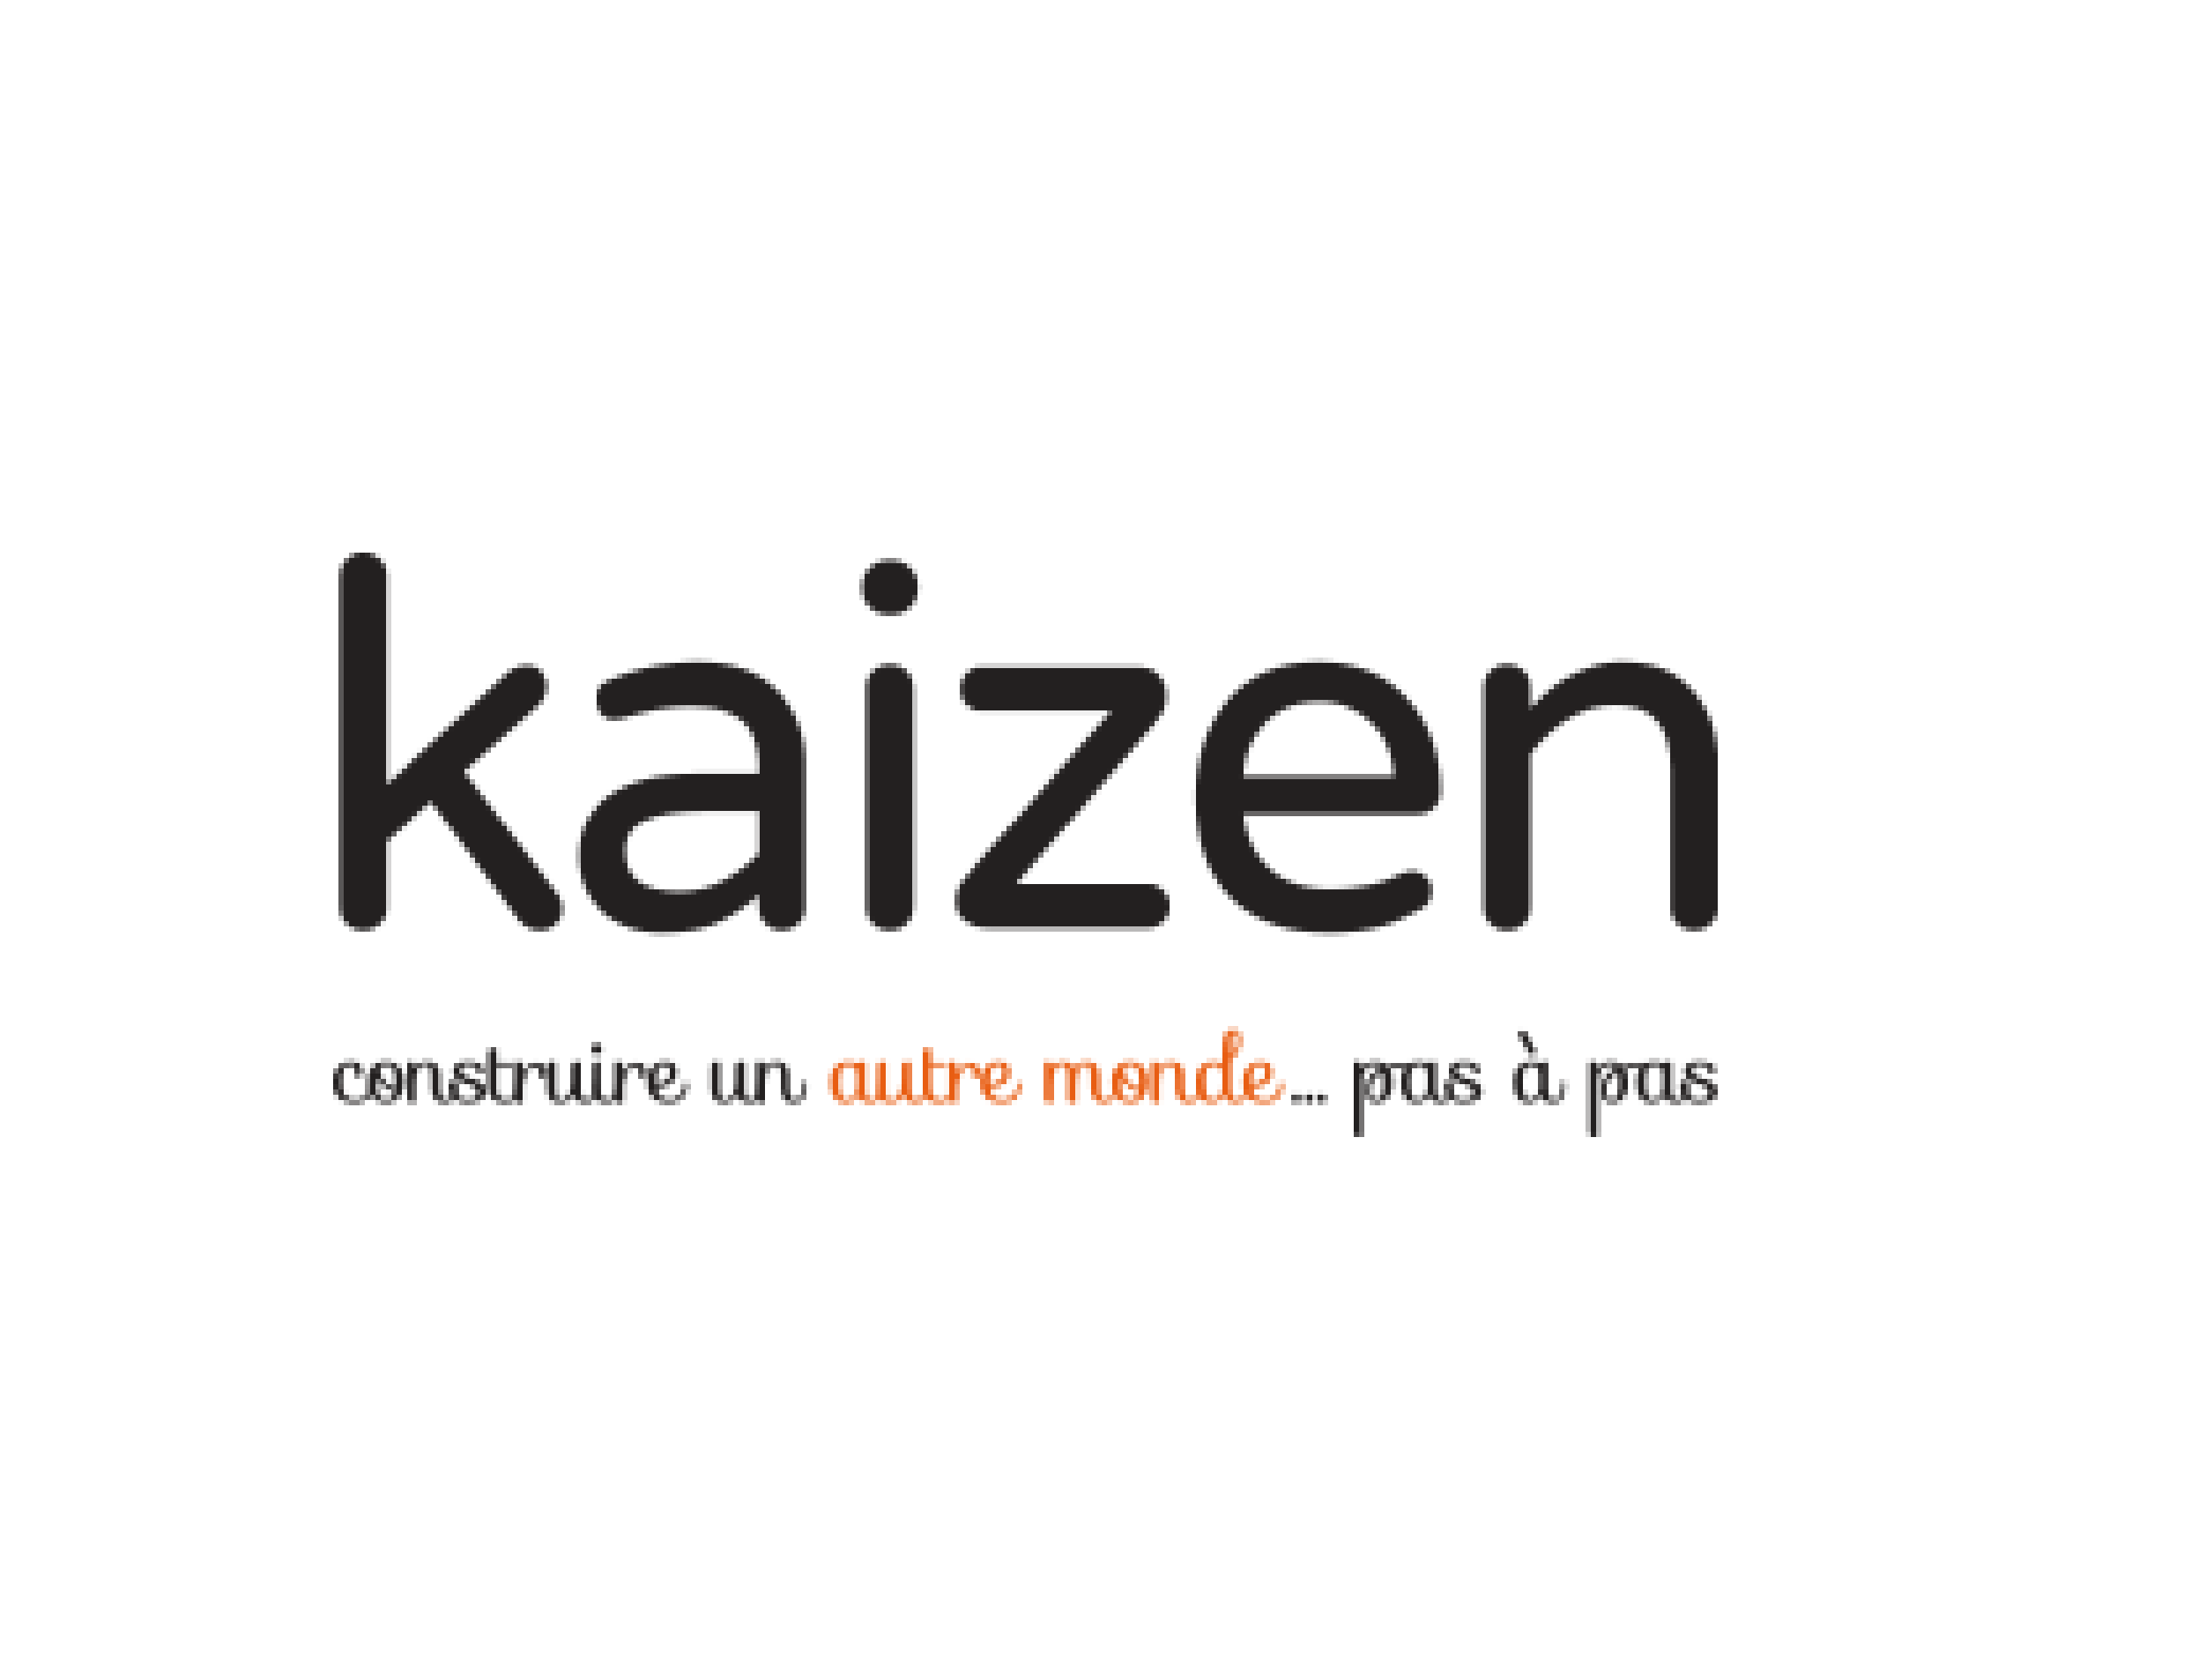 kaizen-01-1425241492.png